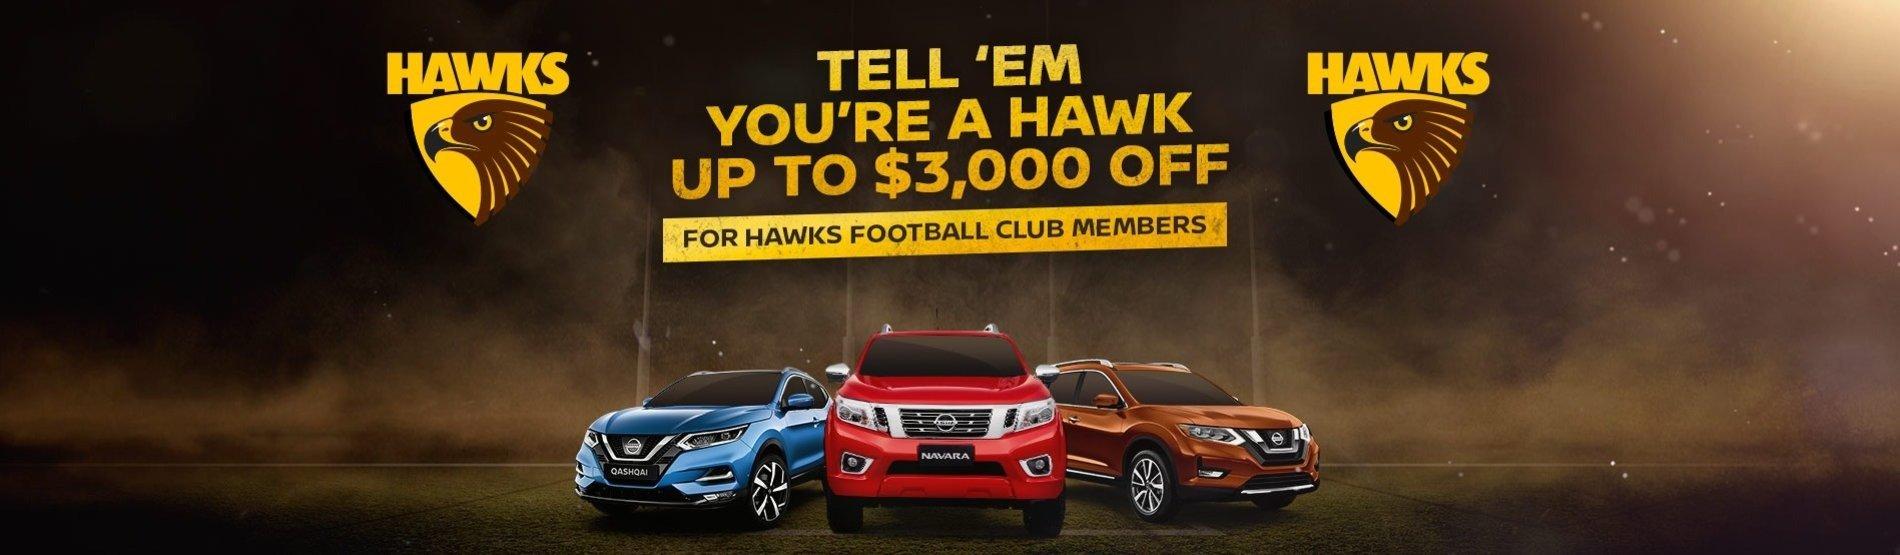 Tell 'em you're a Hawk